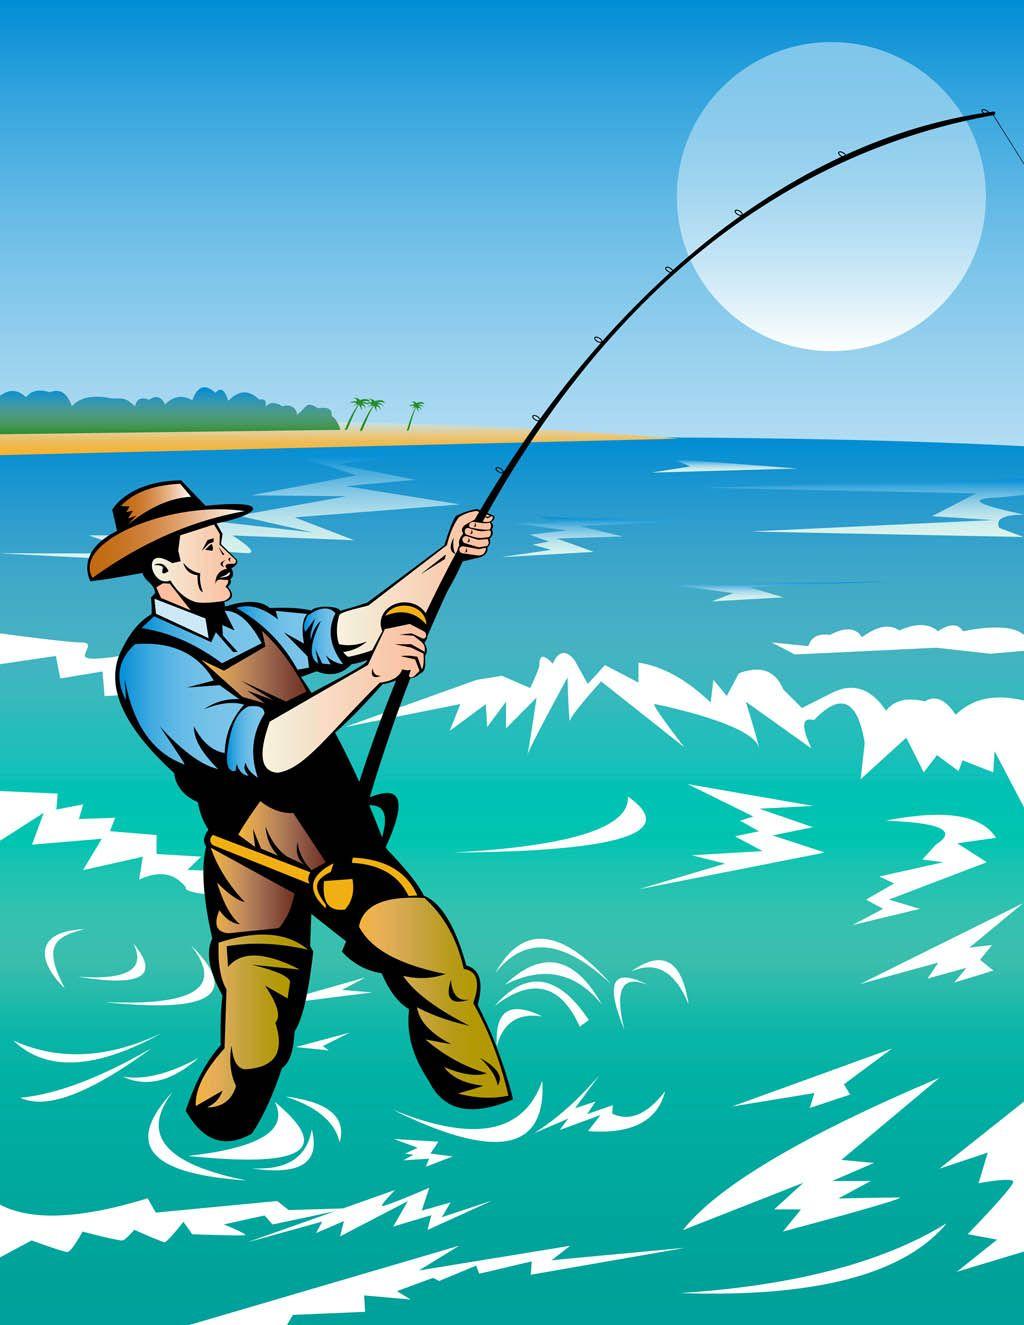 clip art fishing - Google Search | Illustration, It cast ...